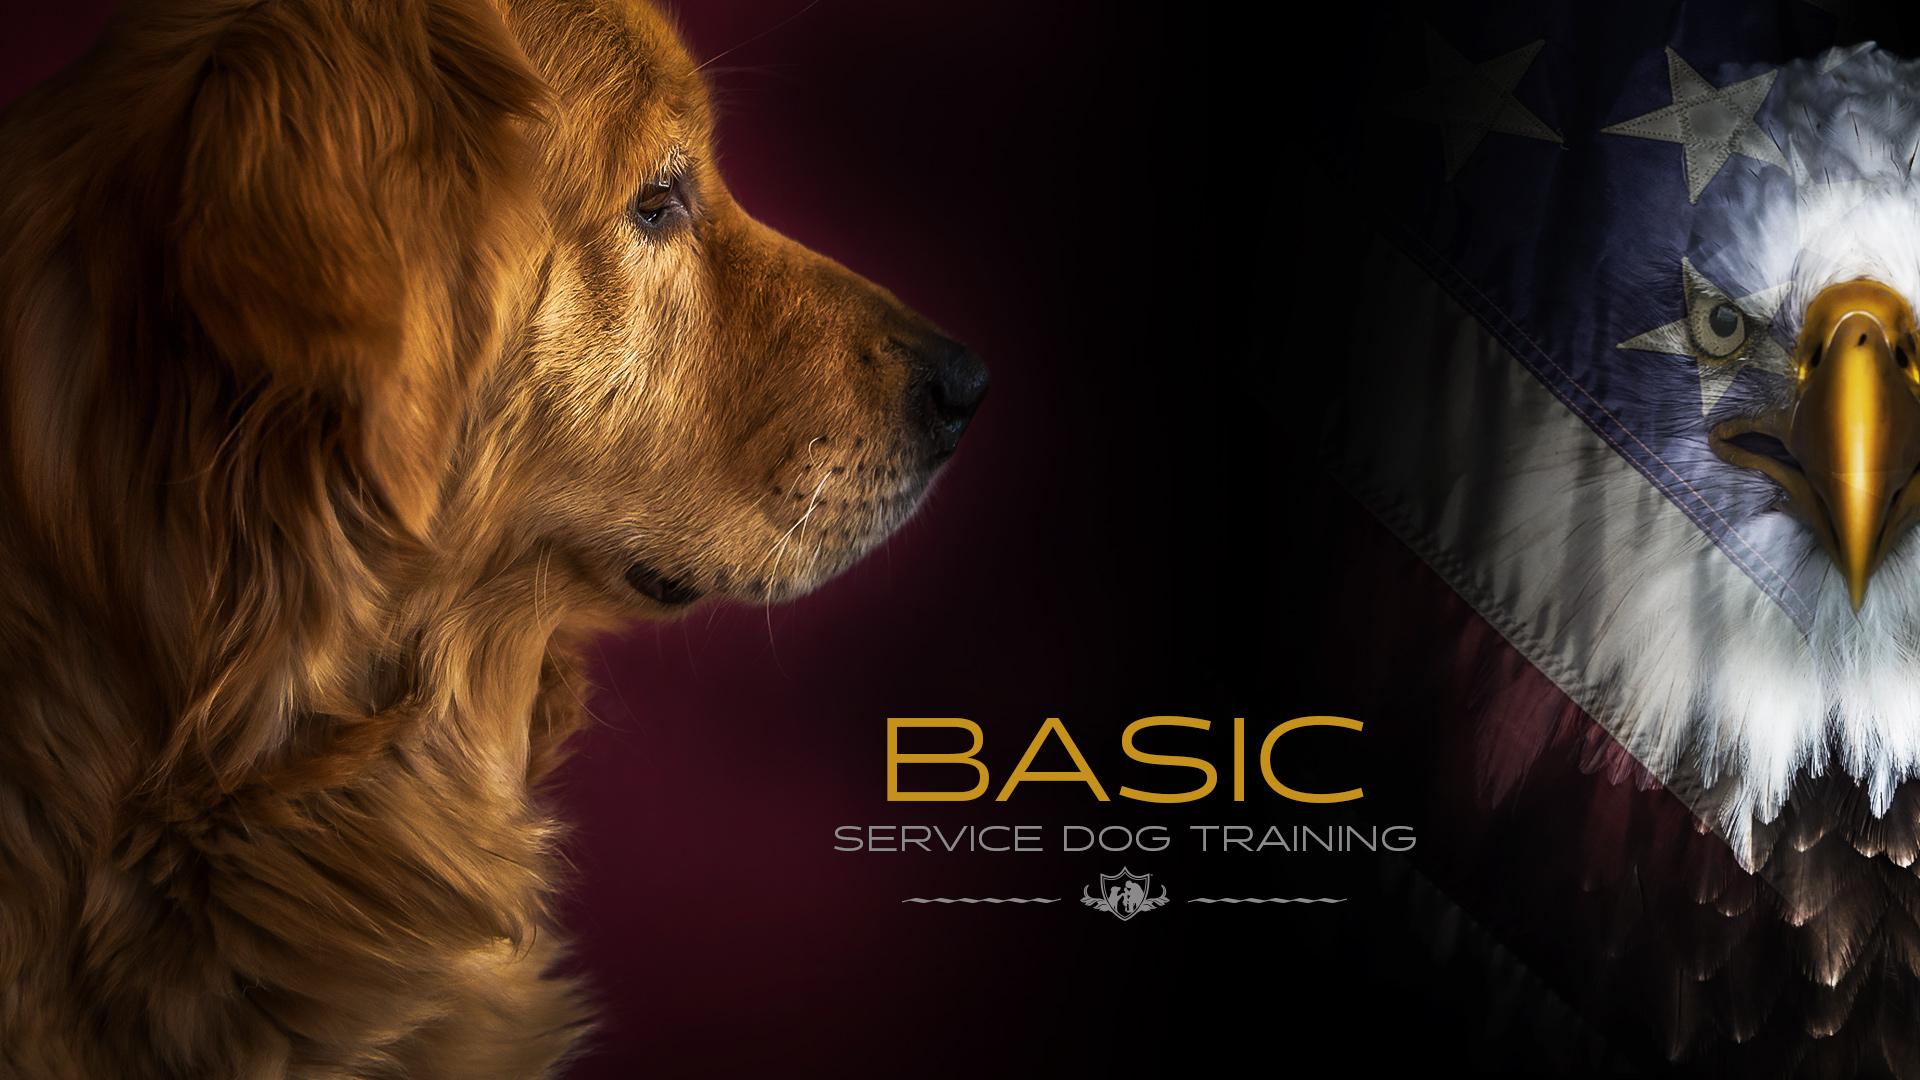 Service Dog Training Program For Veterans K9 Partners For Patriots